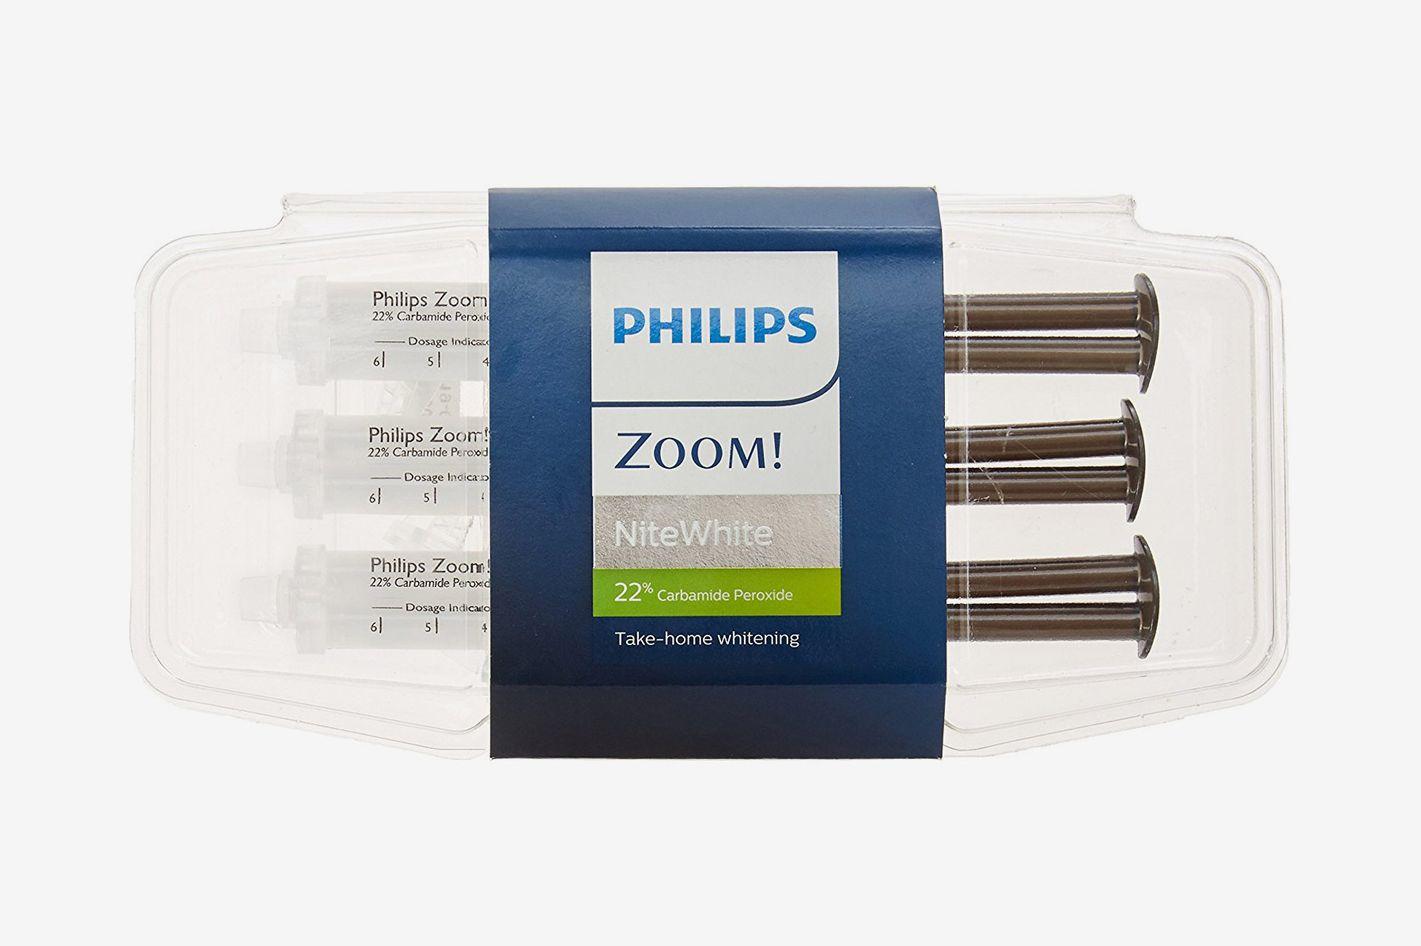 Philips Zoom Nite White 22% Syringe Pack